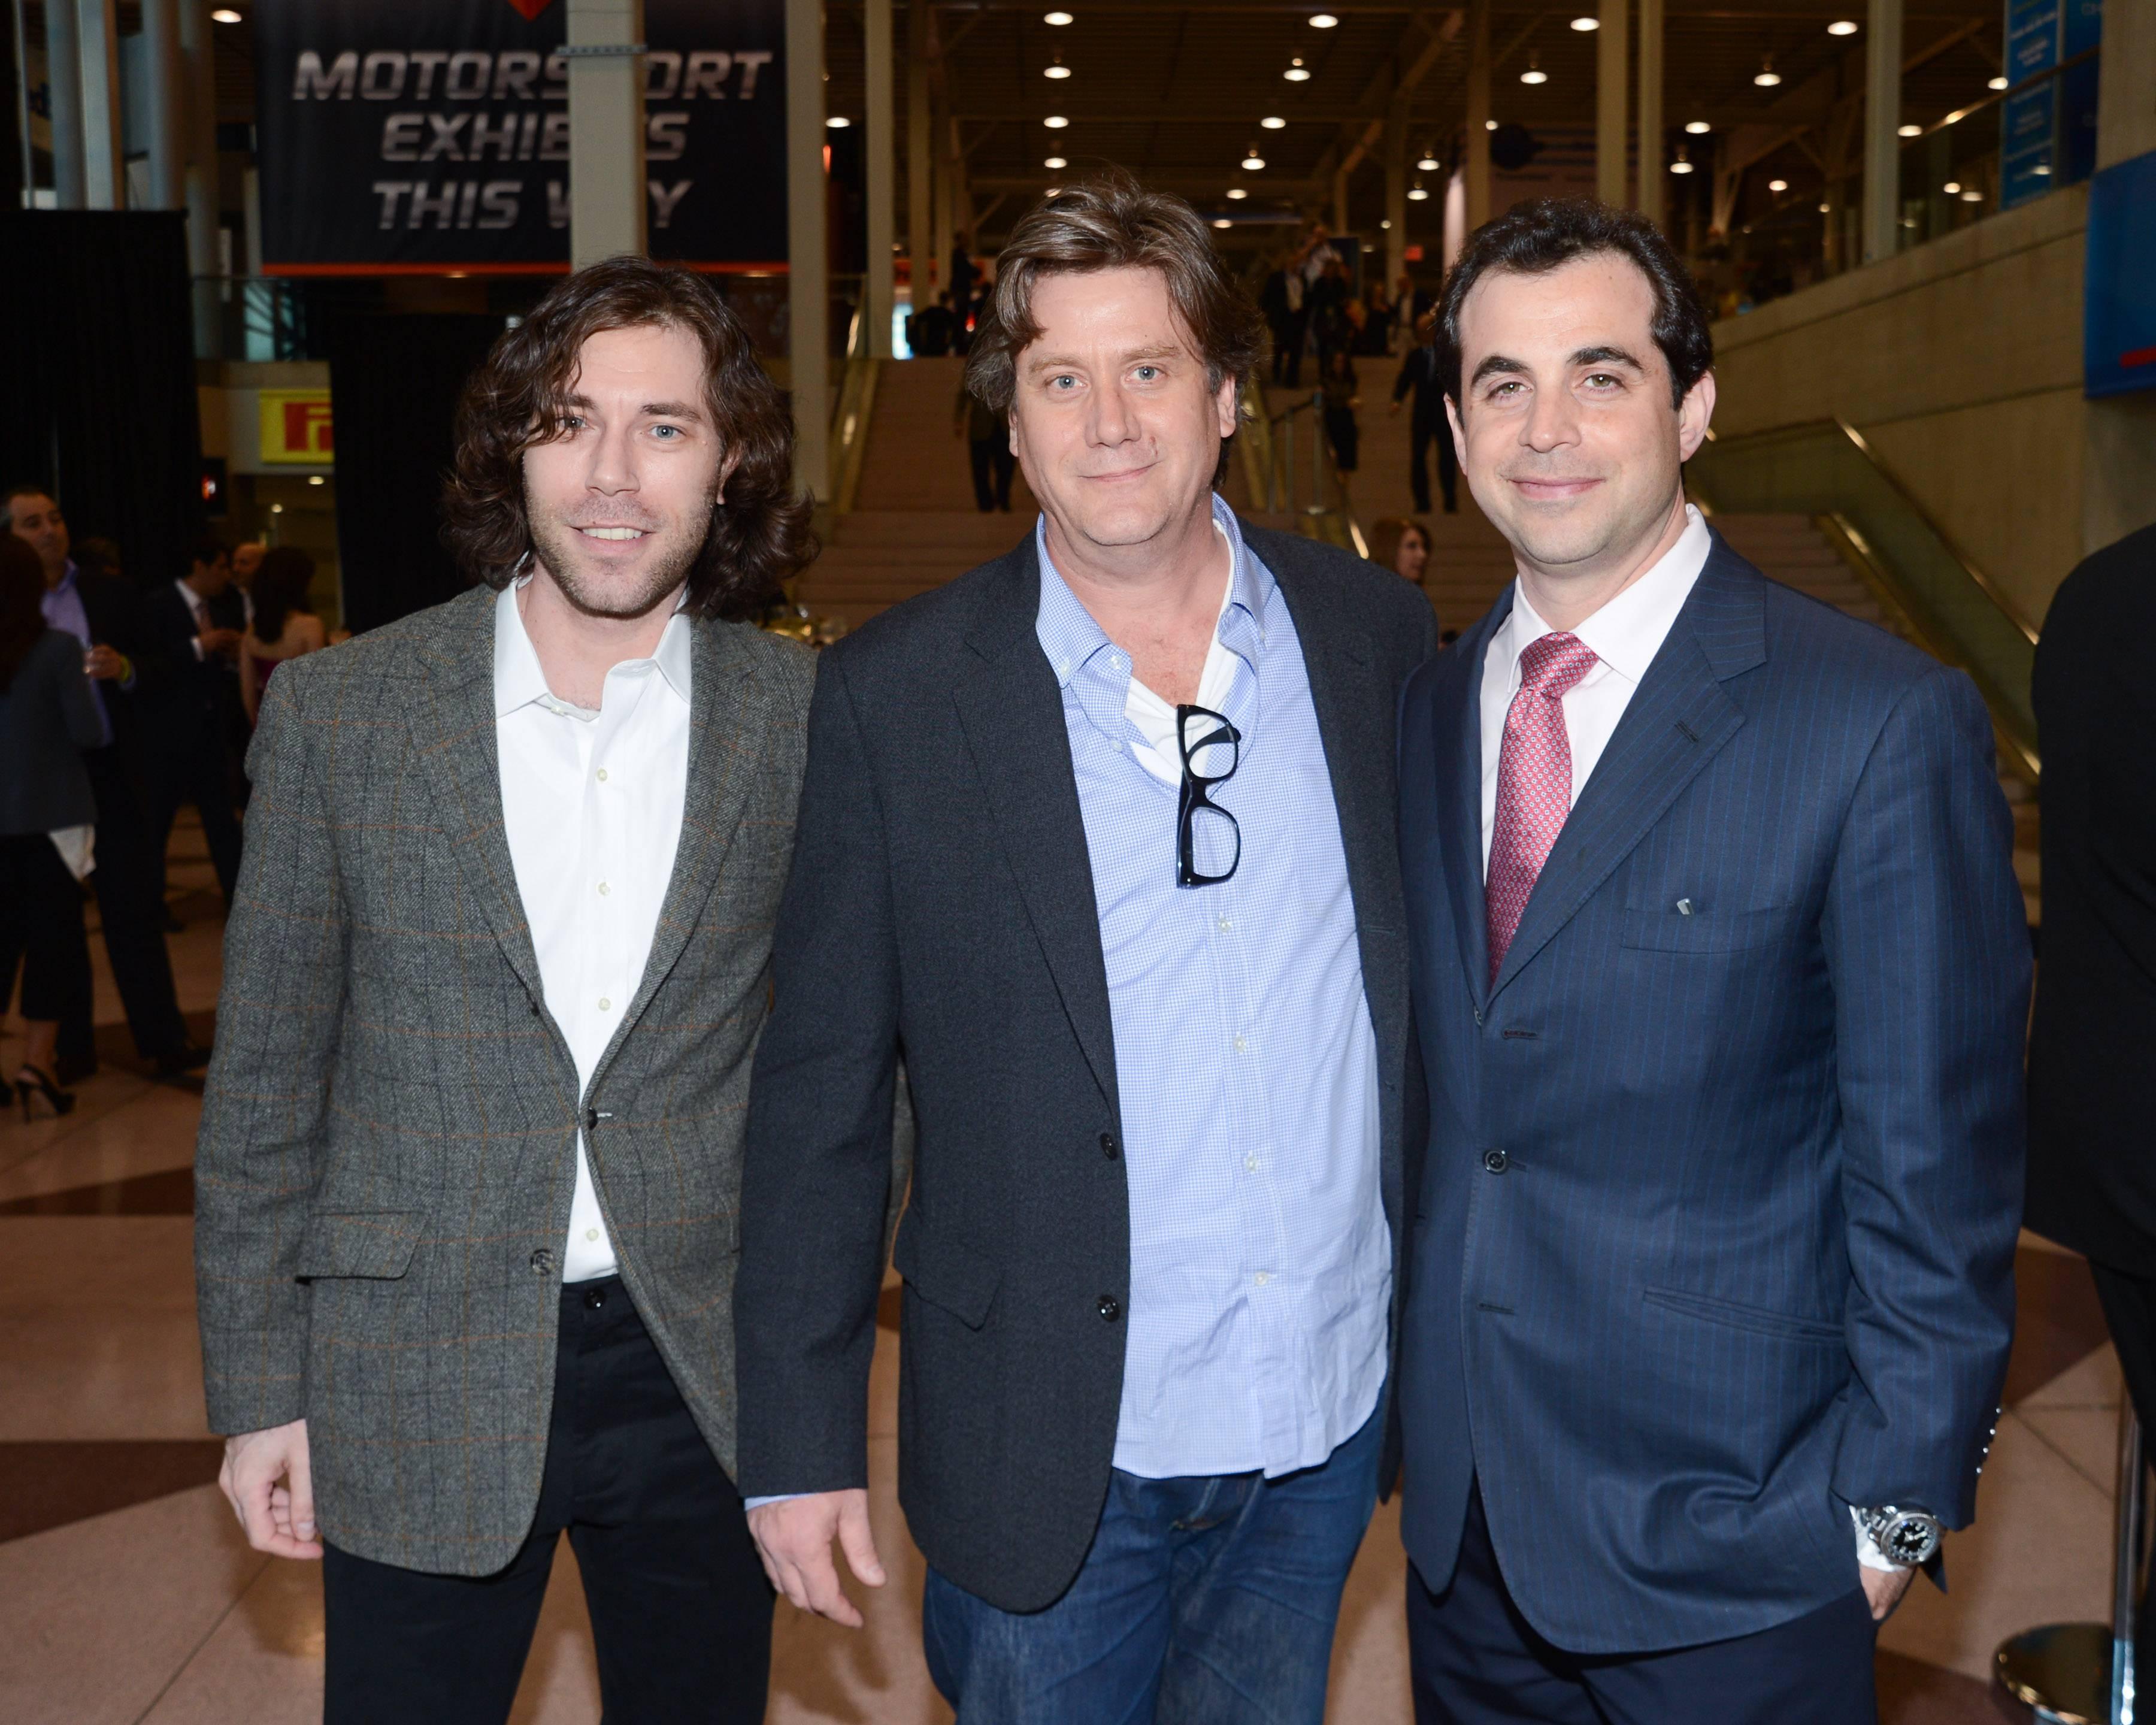 David Levitt, Steven Miller, Justin Green